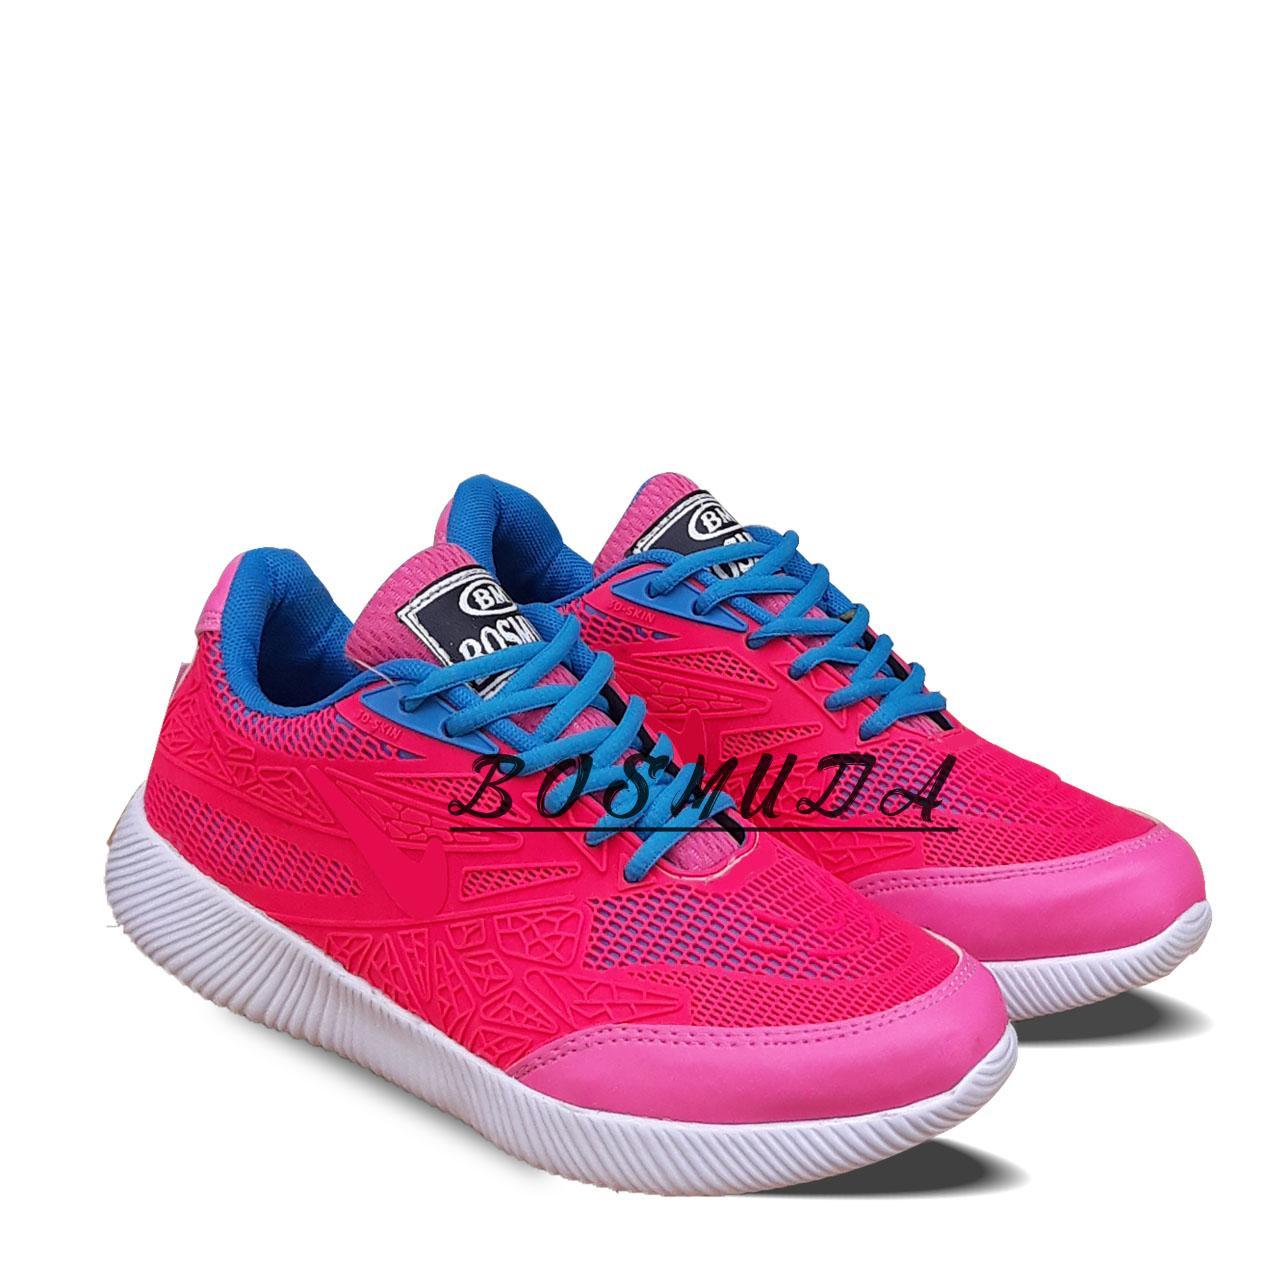 Amelia Olshop - PROMO Sepatu Sneakers Wanita TD 03 36-40   Sepatu Sneakers  BOSMUDA 2b27e8f3e8